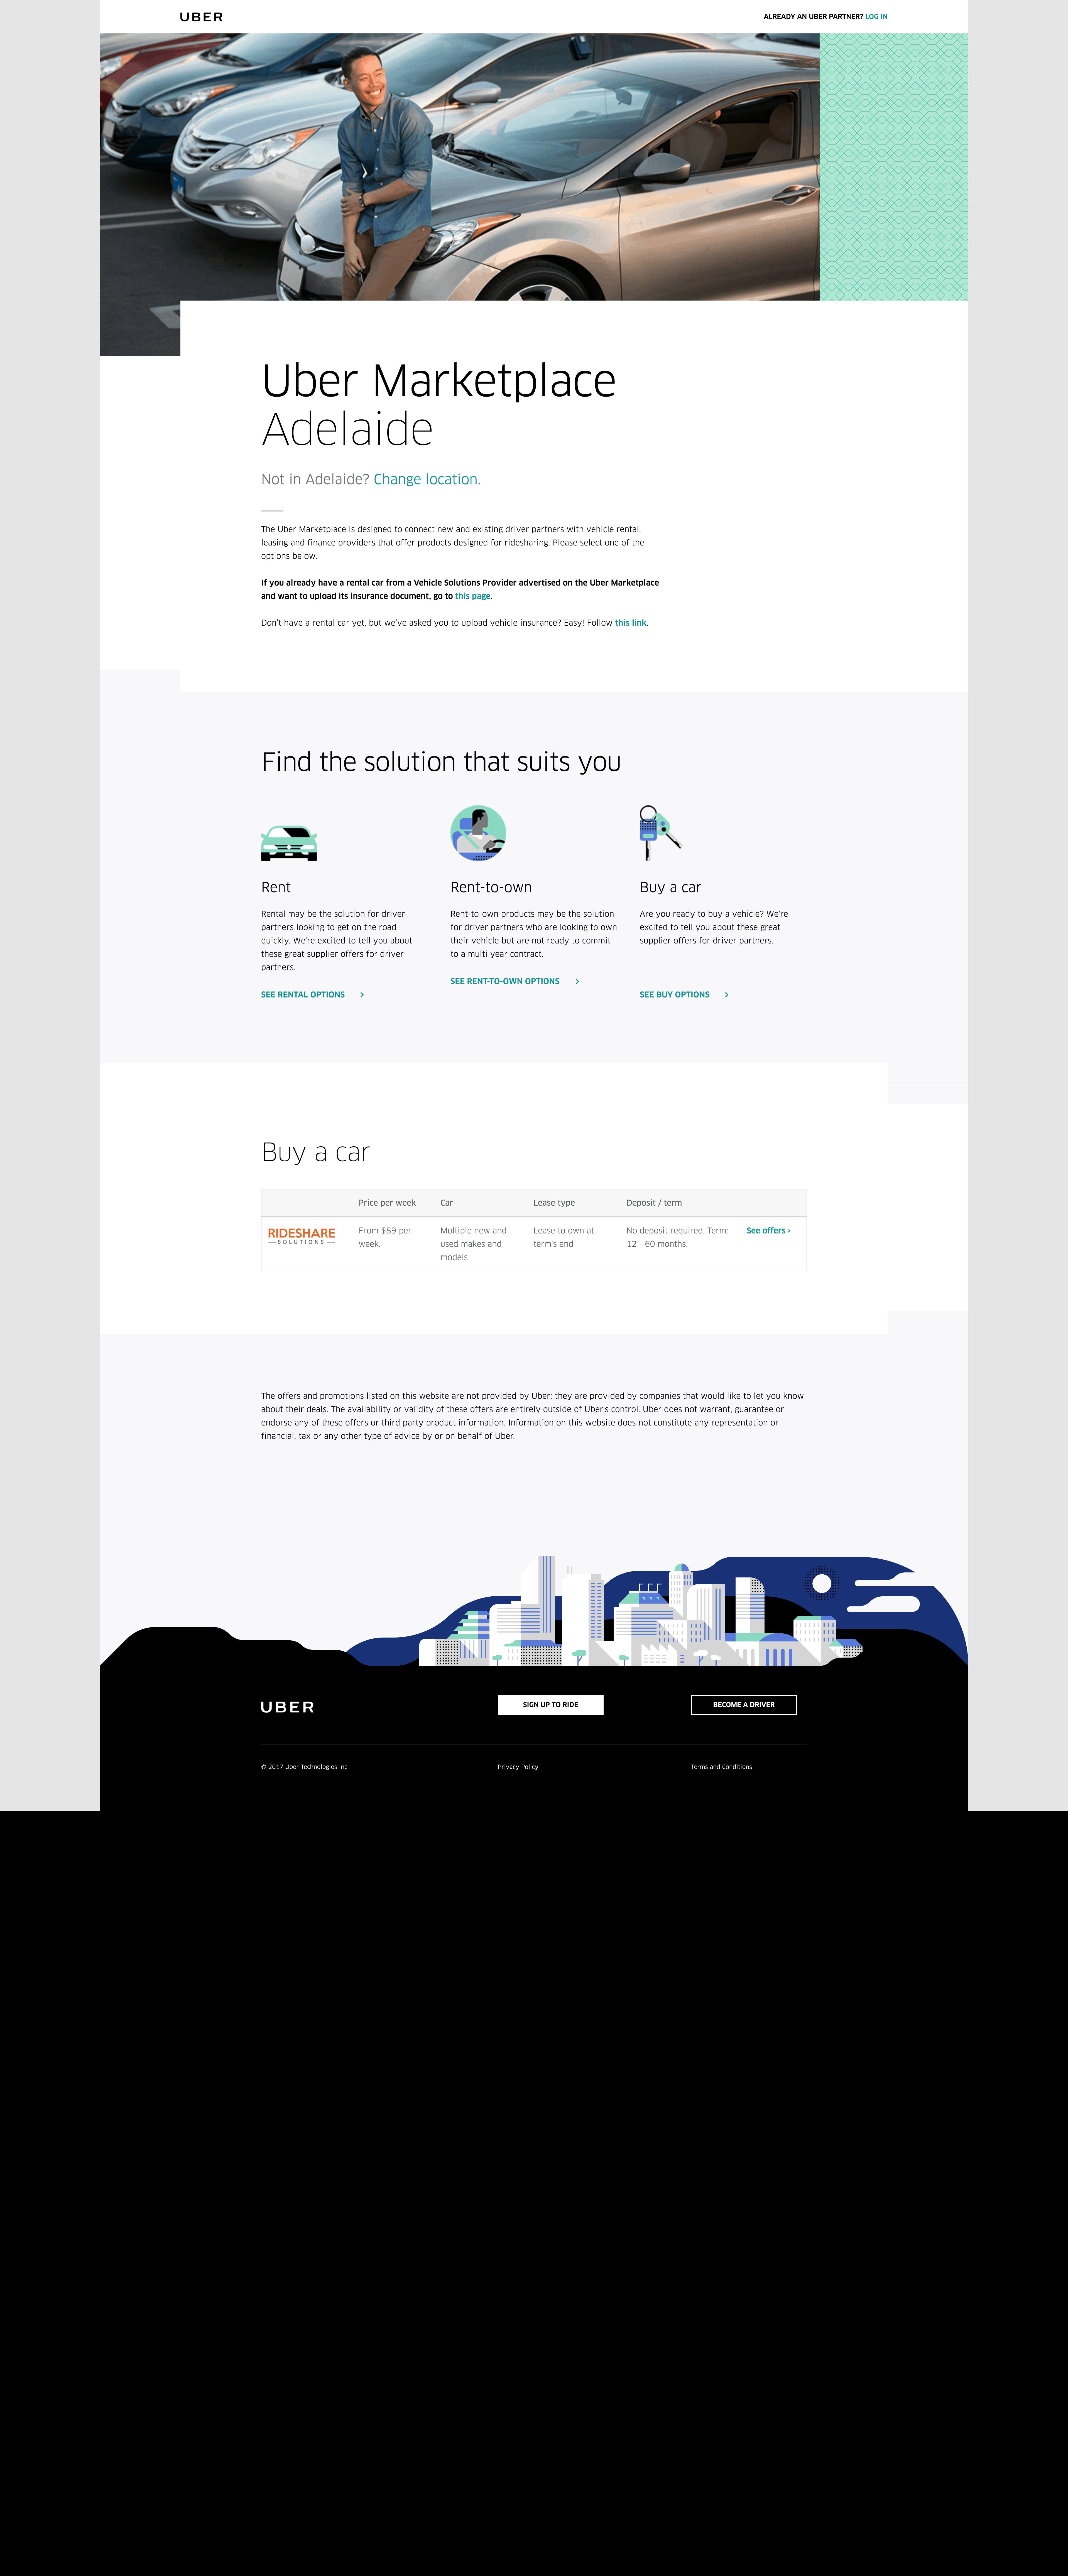 Adelaide Market Place by Uber About Us Advertising Walkthrough Web  - UI Garage - The database of UI